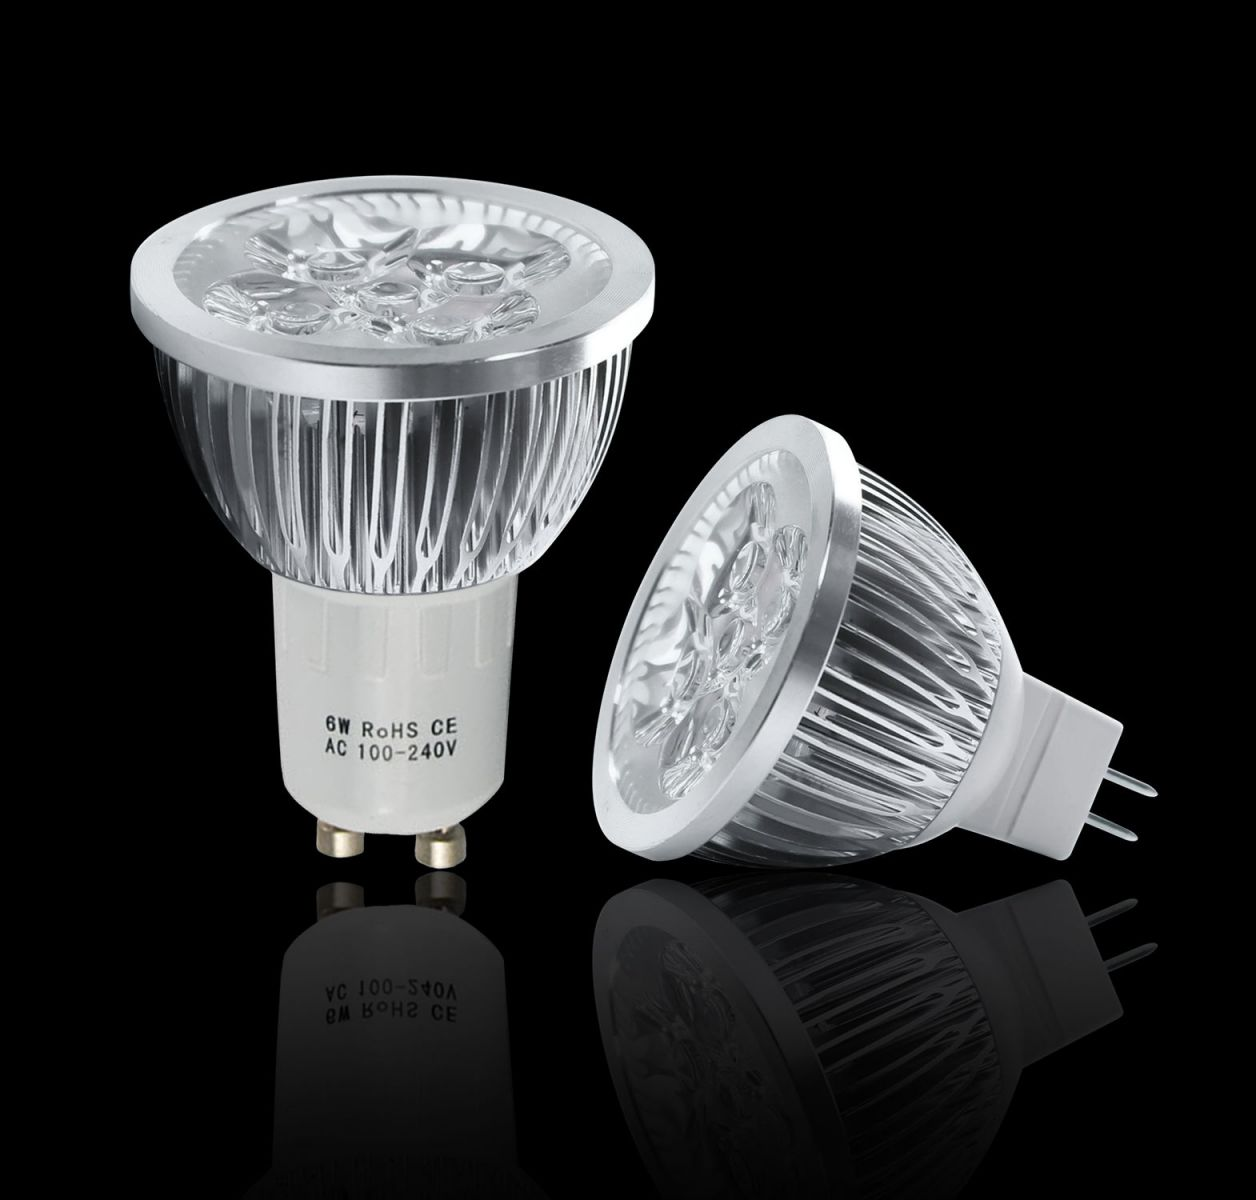 10 x gu10 mr16 led lamps 6w high power spotlight day. Black Bedroom Furniture Sets. Home Design Ideas